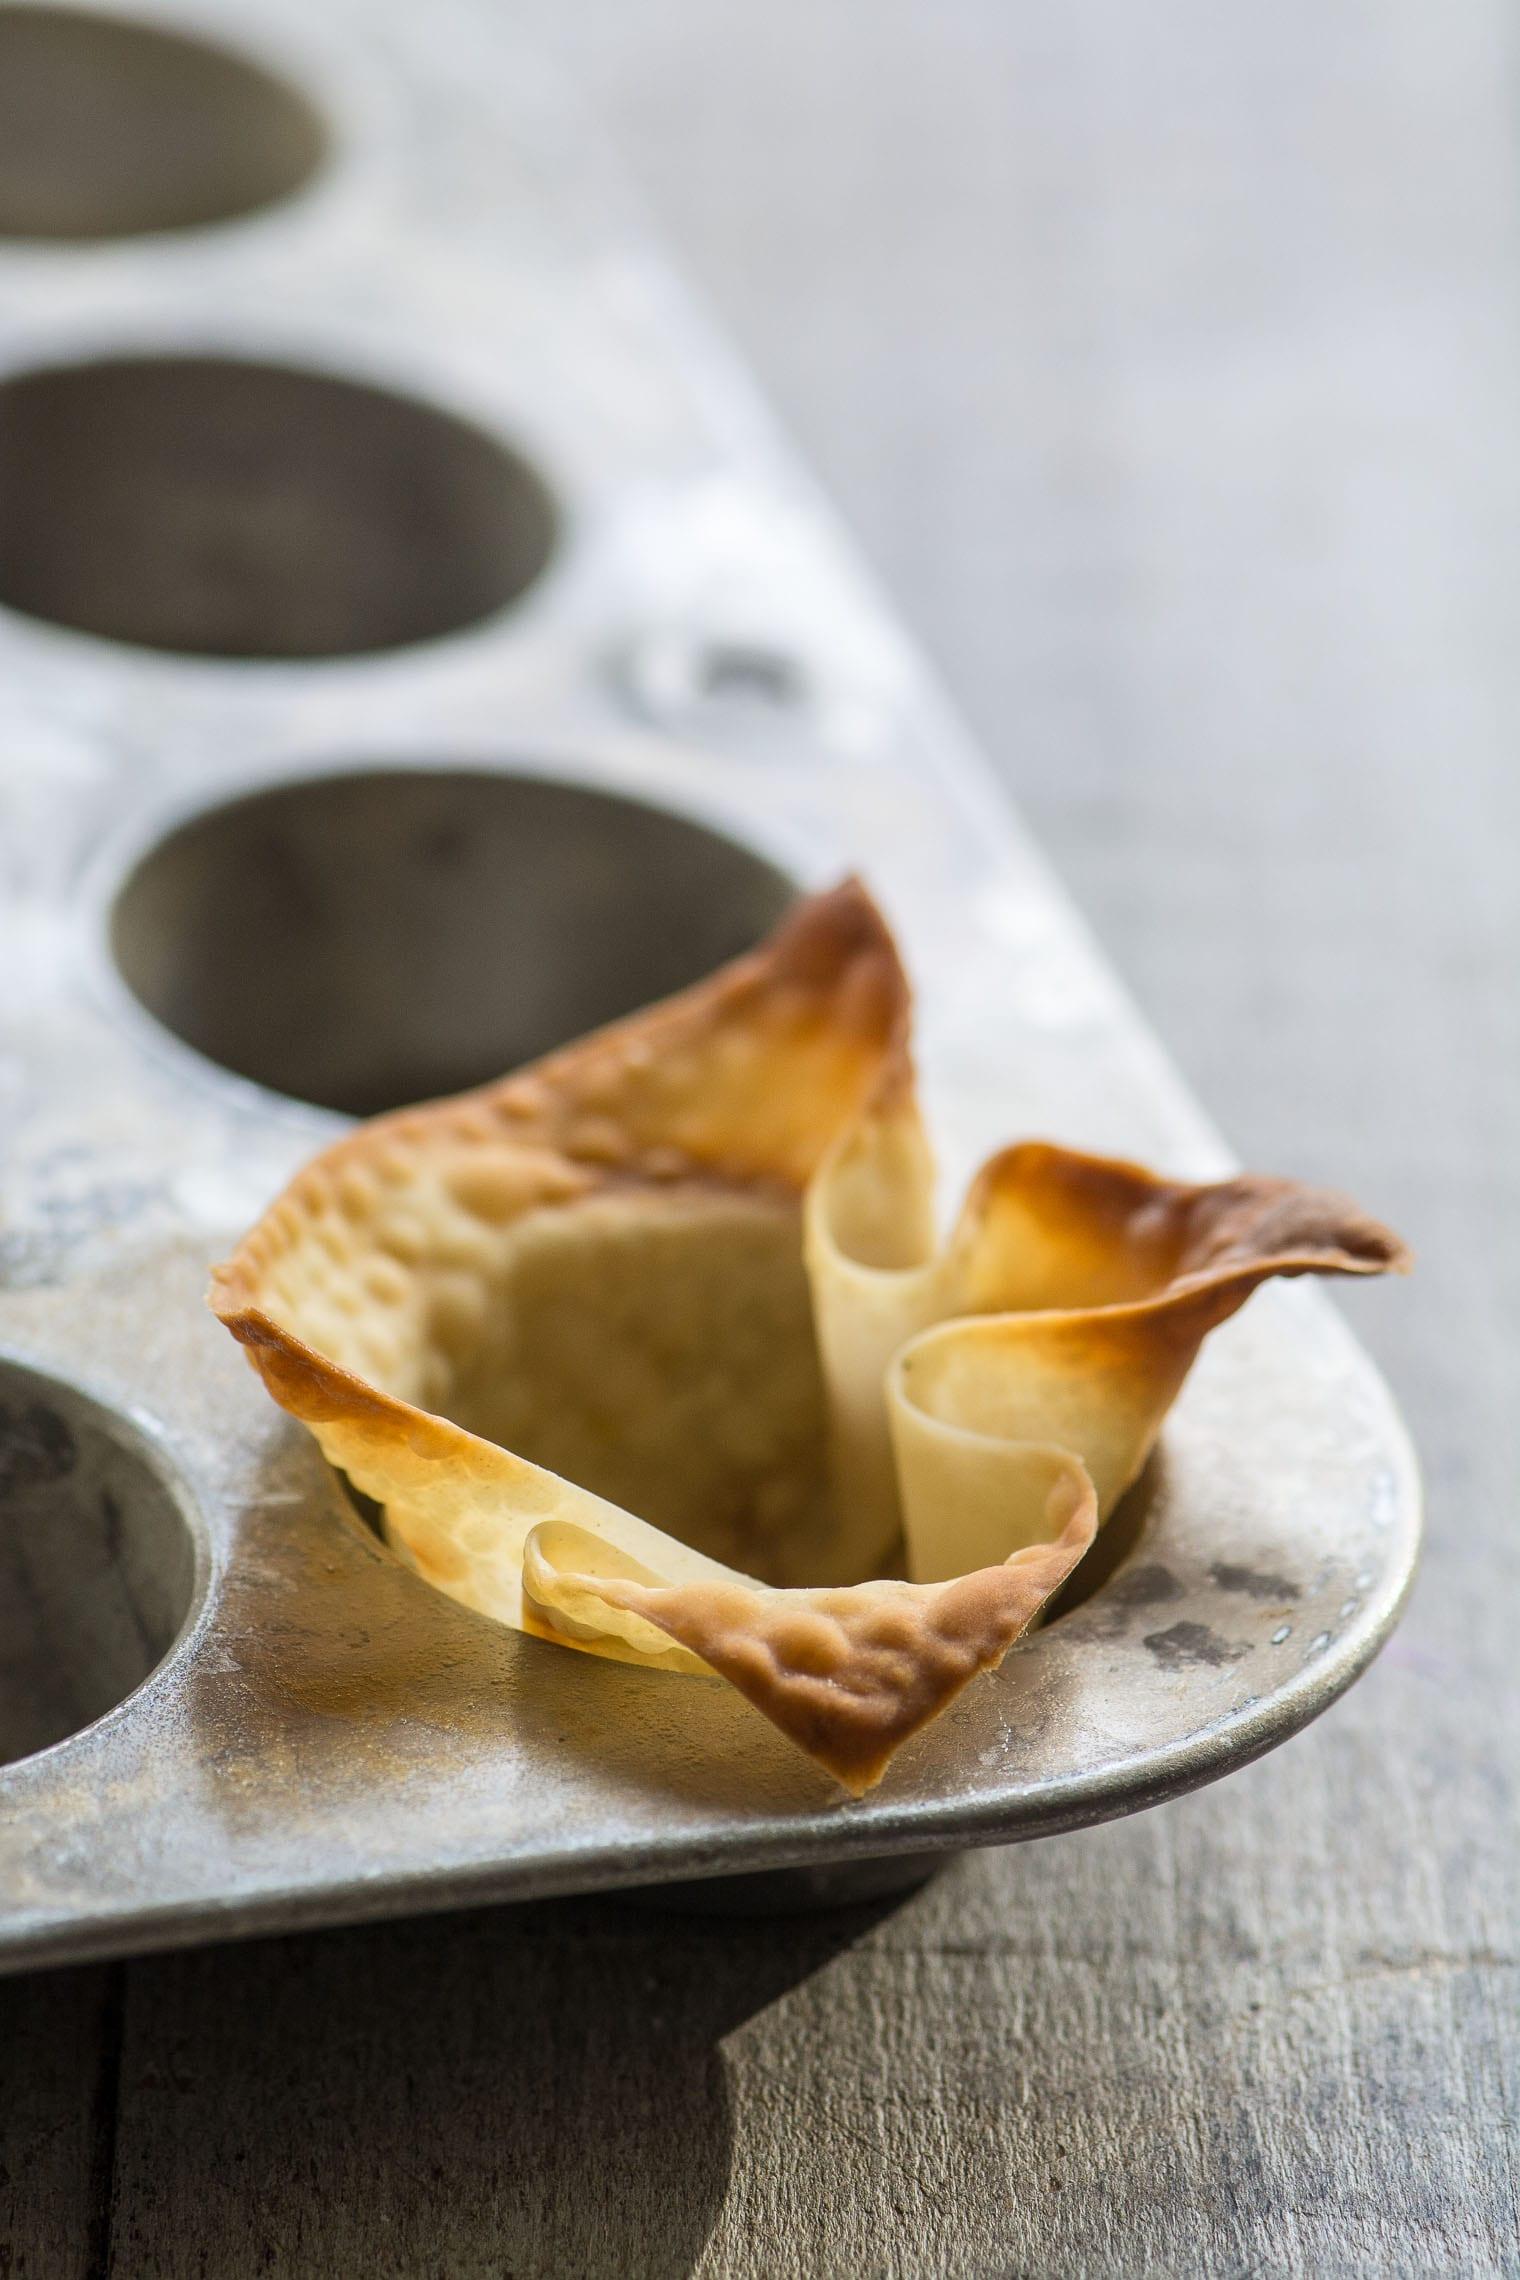 Spicy Tuna Wonton Cups, photo